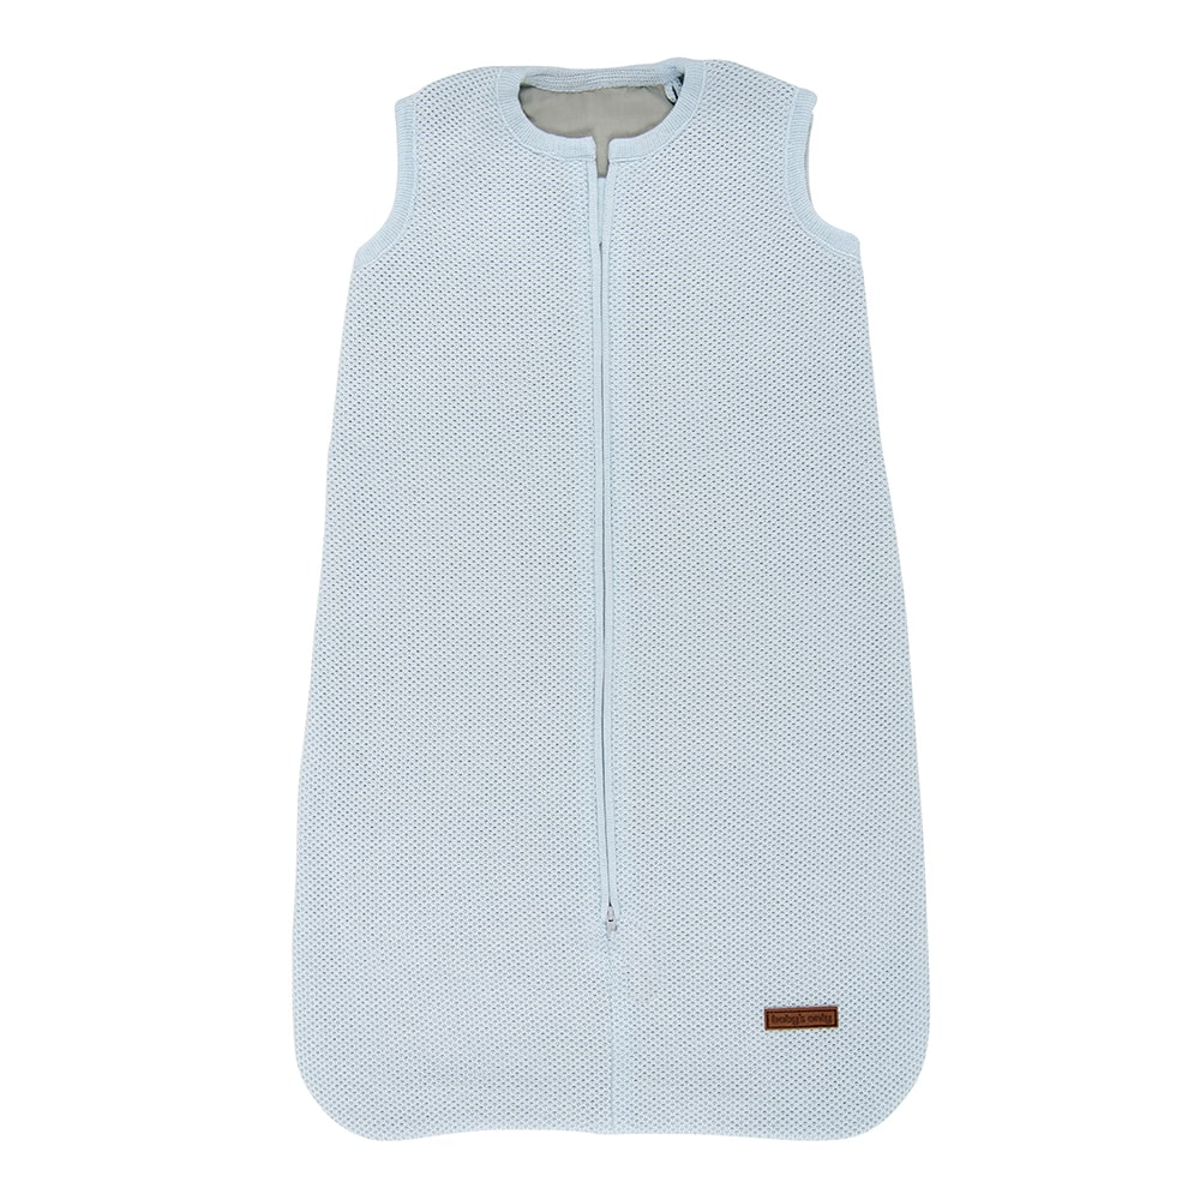 sleeping bag classic powder blue 70 cm